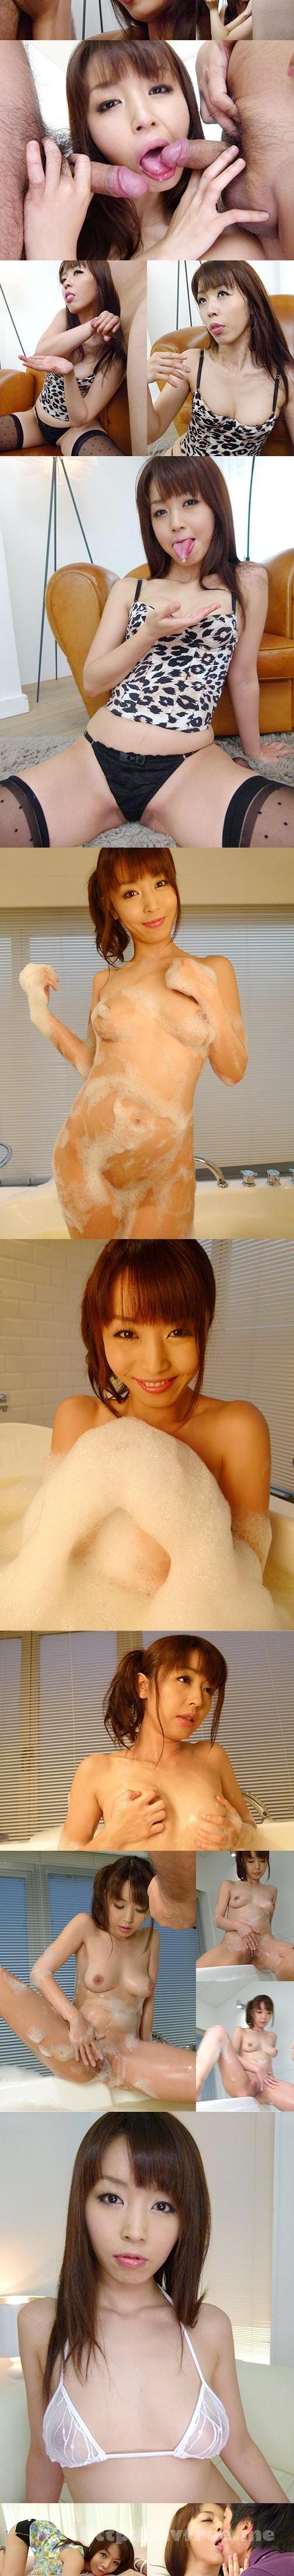 [MKBD-S36][MKD-S36] KIRARI 36 ~まりかのパイパン潮吹き中出しSEX!!~ : まりか - image MKBD-S36_3 on https://javfree.me